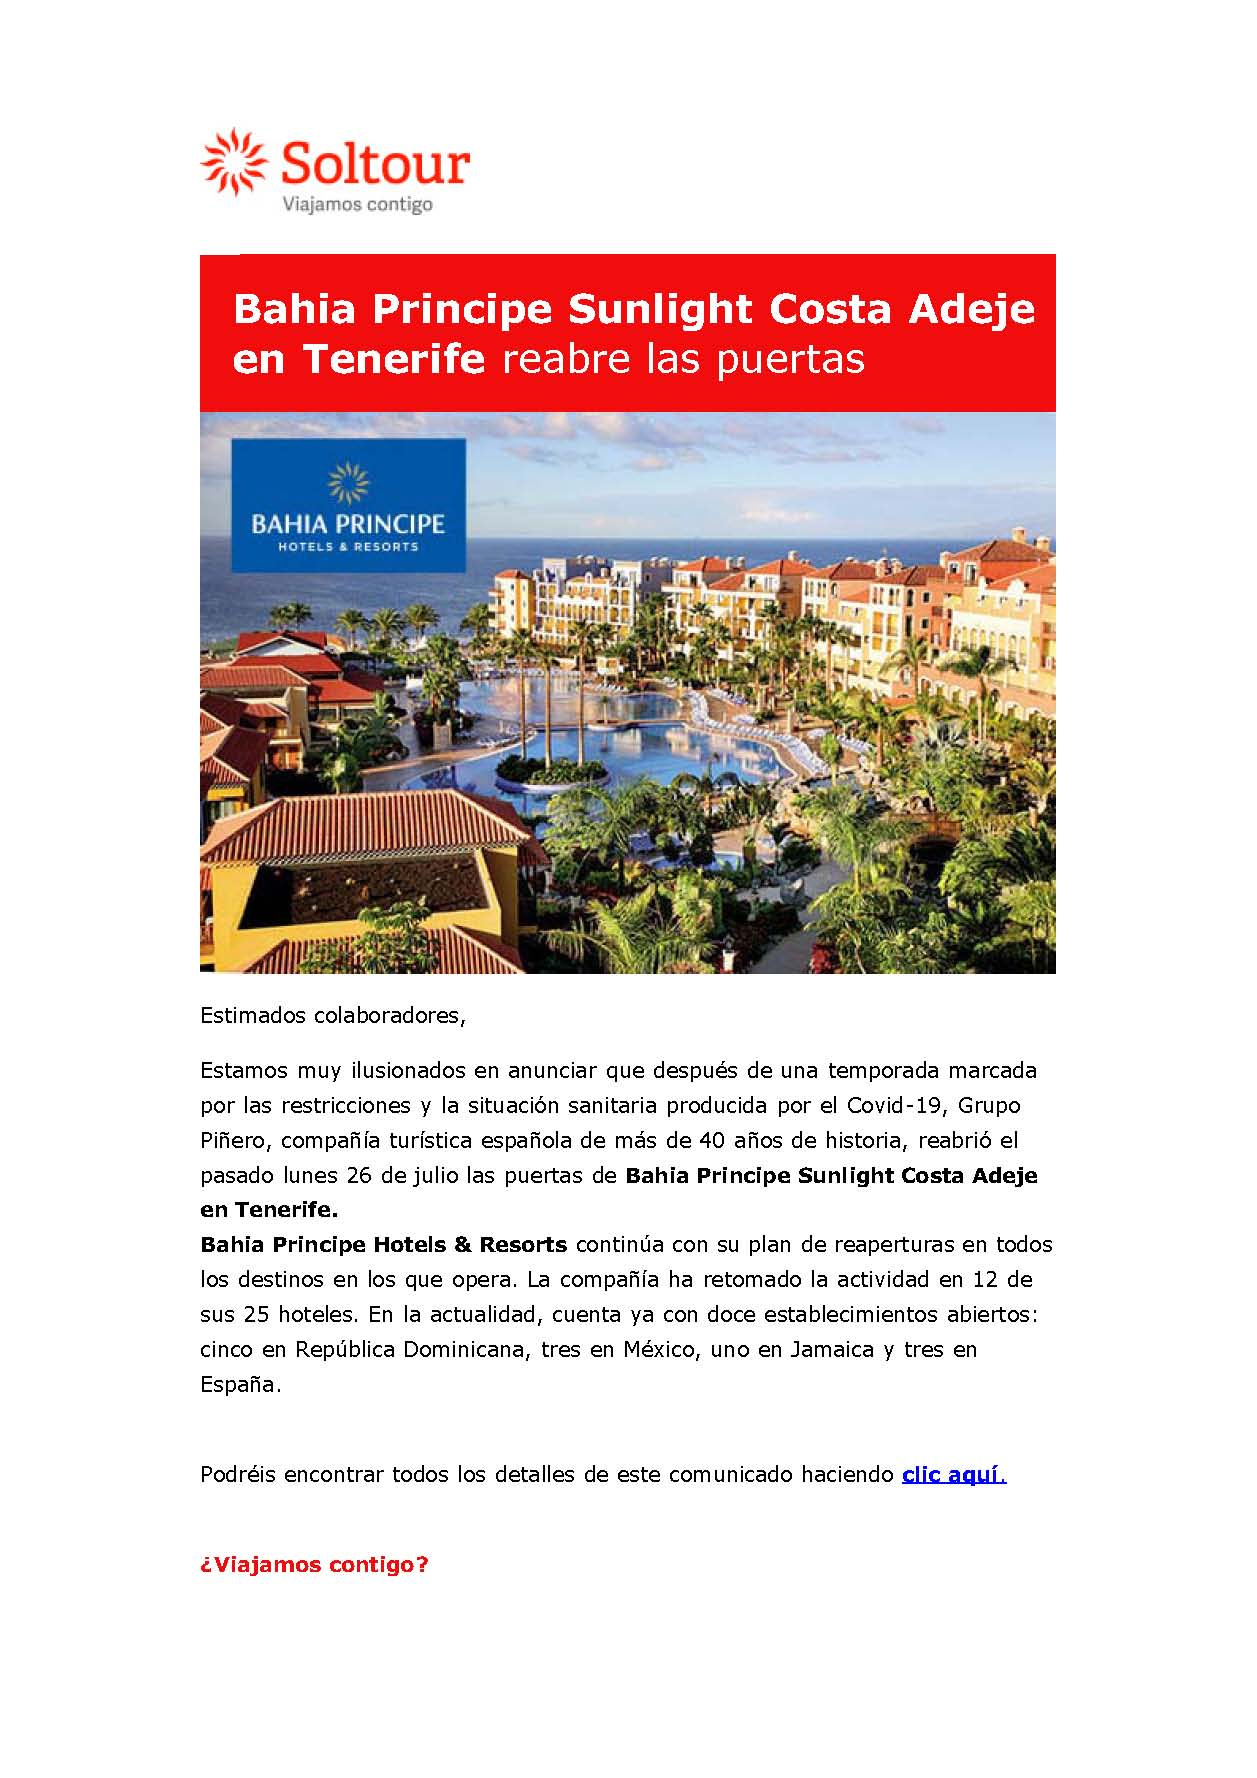 Reapertura Bahía Príncipe Sunlight Costa Adeje 26-7-2021